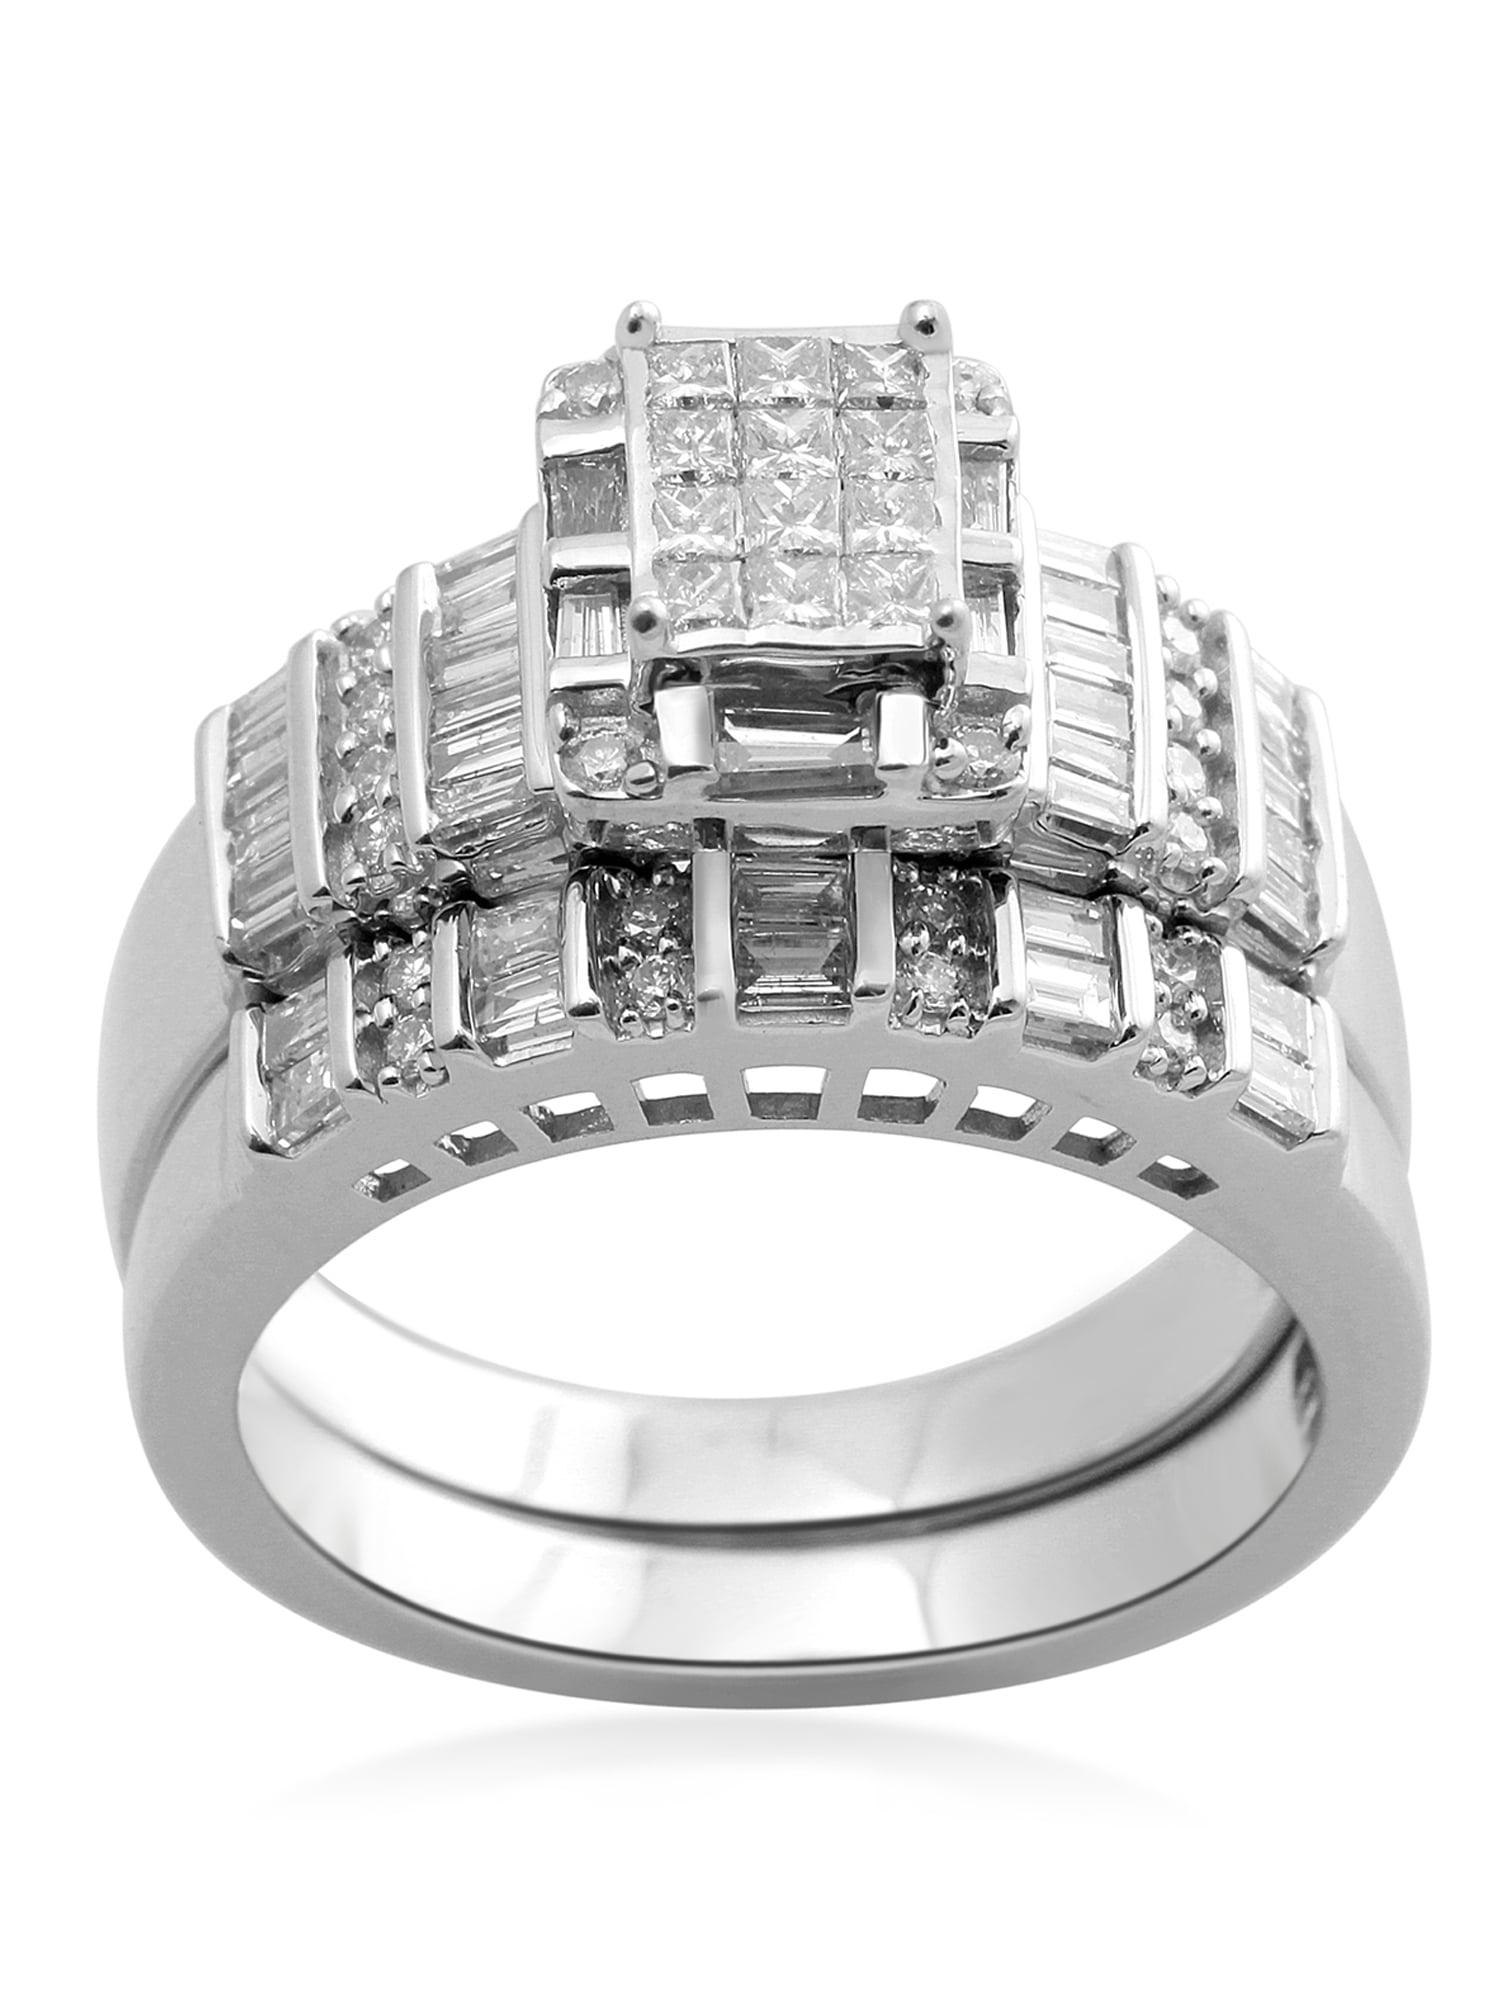 1 Carat T.W. Princess Diamond Sterling Silver Bridal Set by Generic